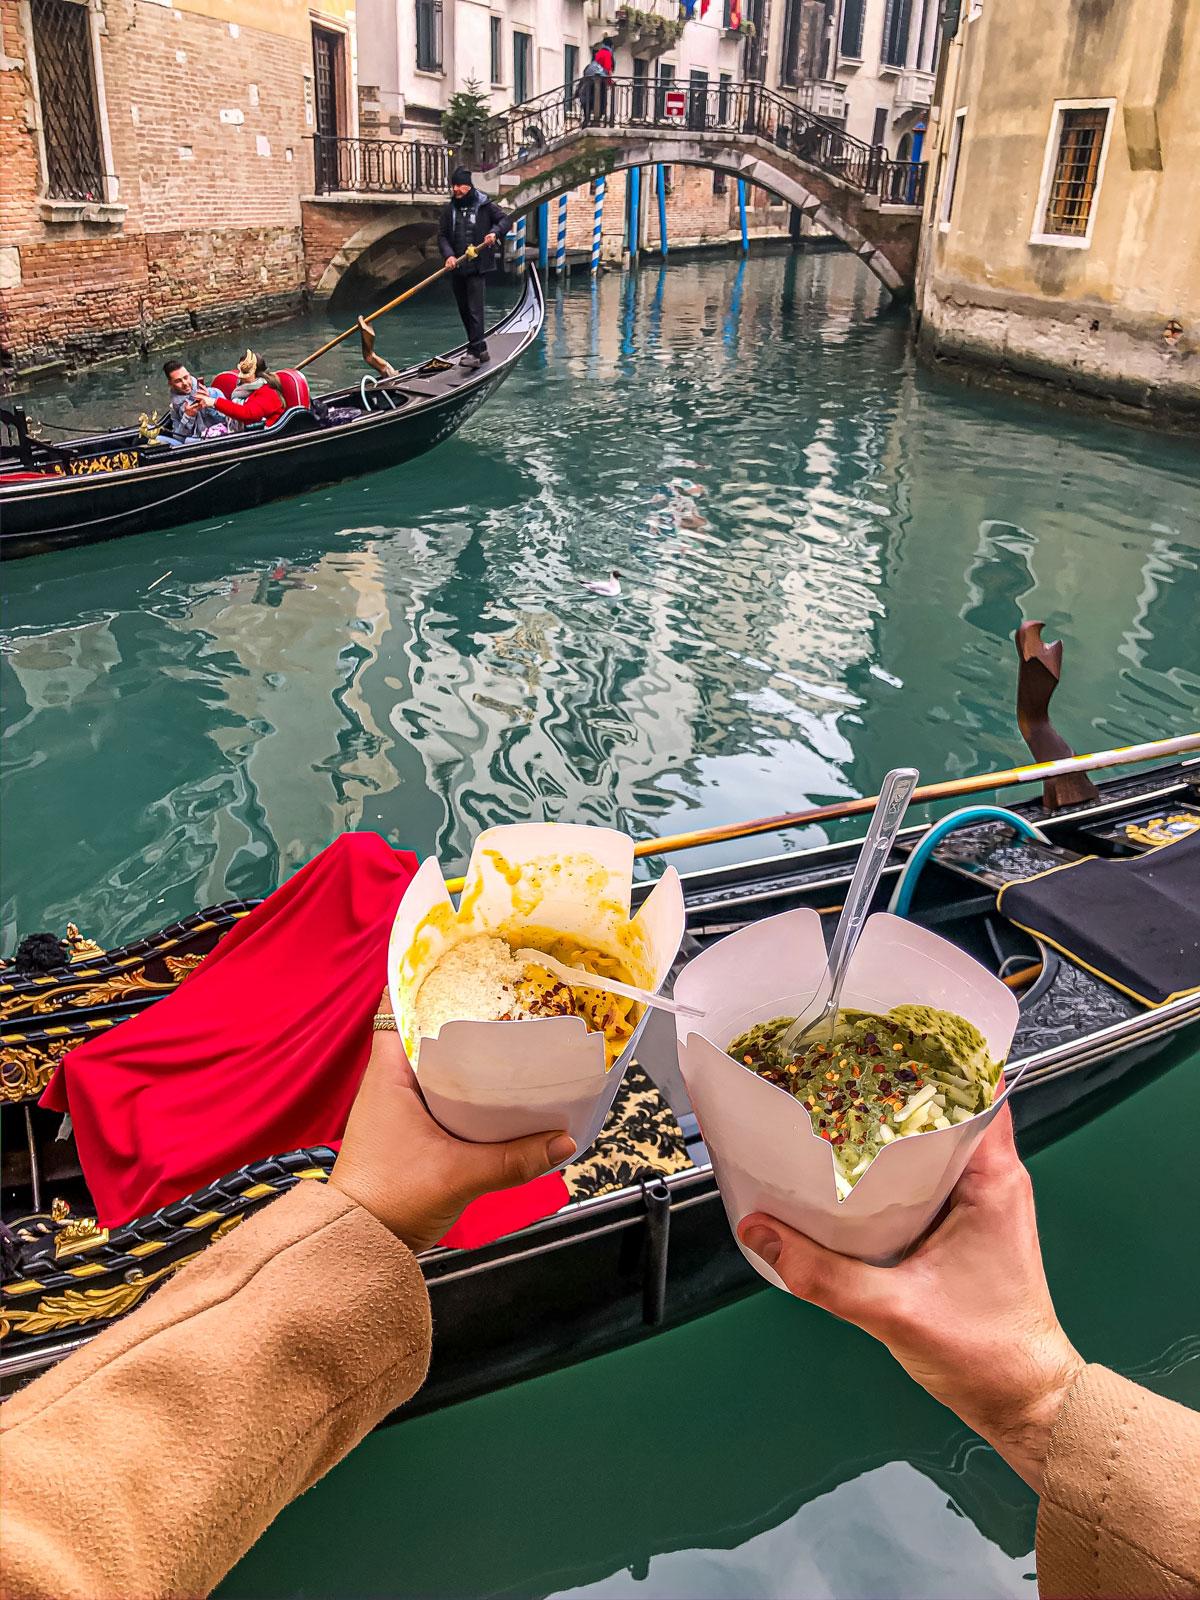 27-top-things-to-do-in-Venice---Venice-Instagram-spots-–-Venice-bucket-list---kelseyinlondon---kelsey-heinrichs---venice-gondola-ride---venice-grand-canal